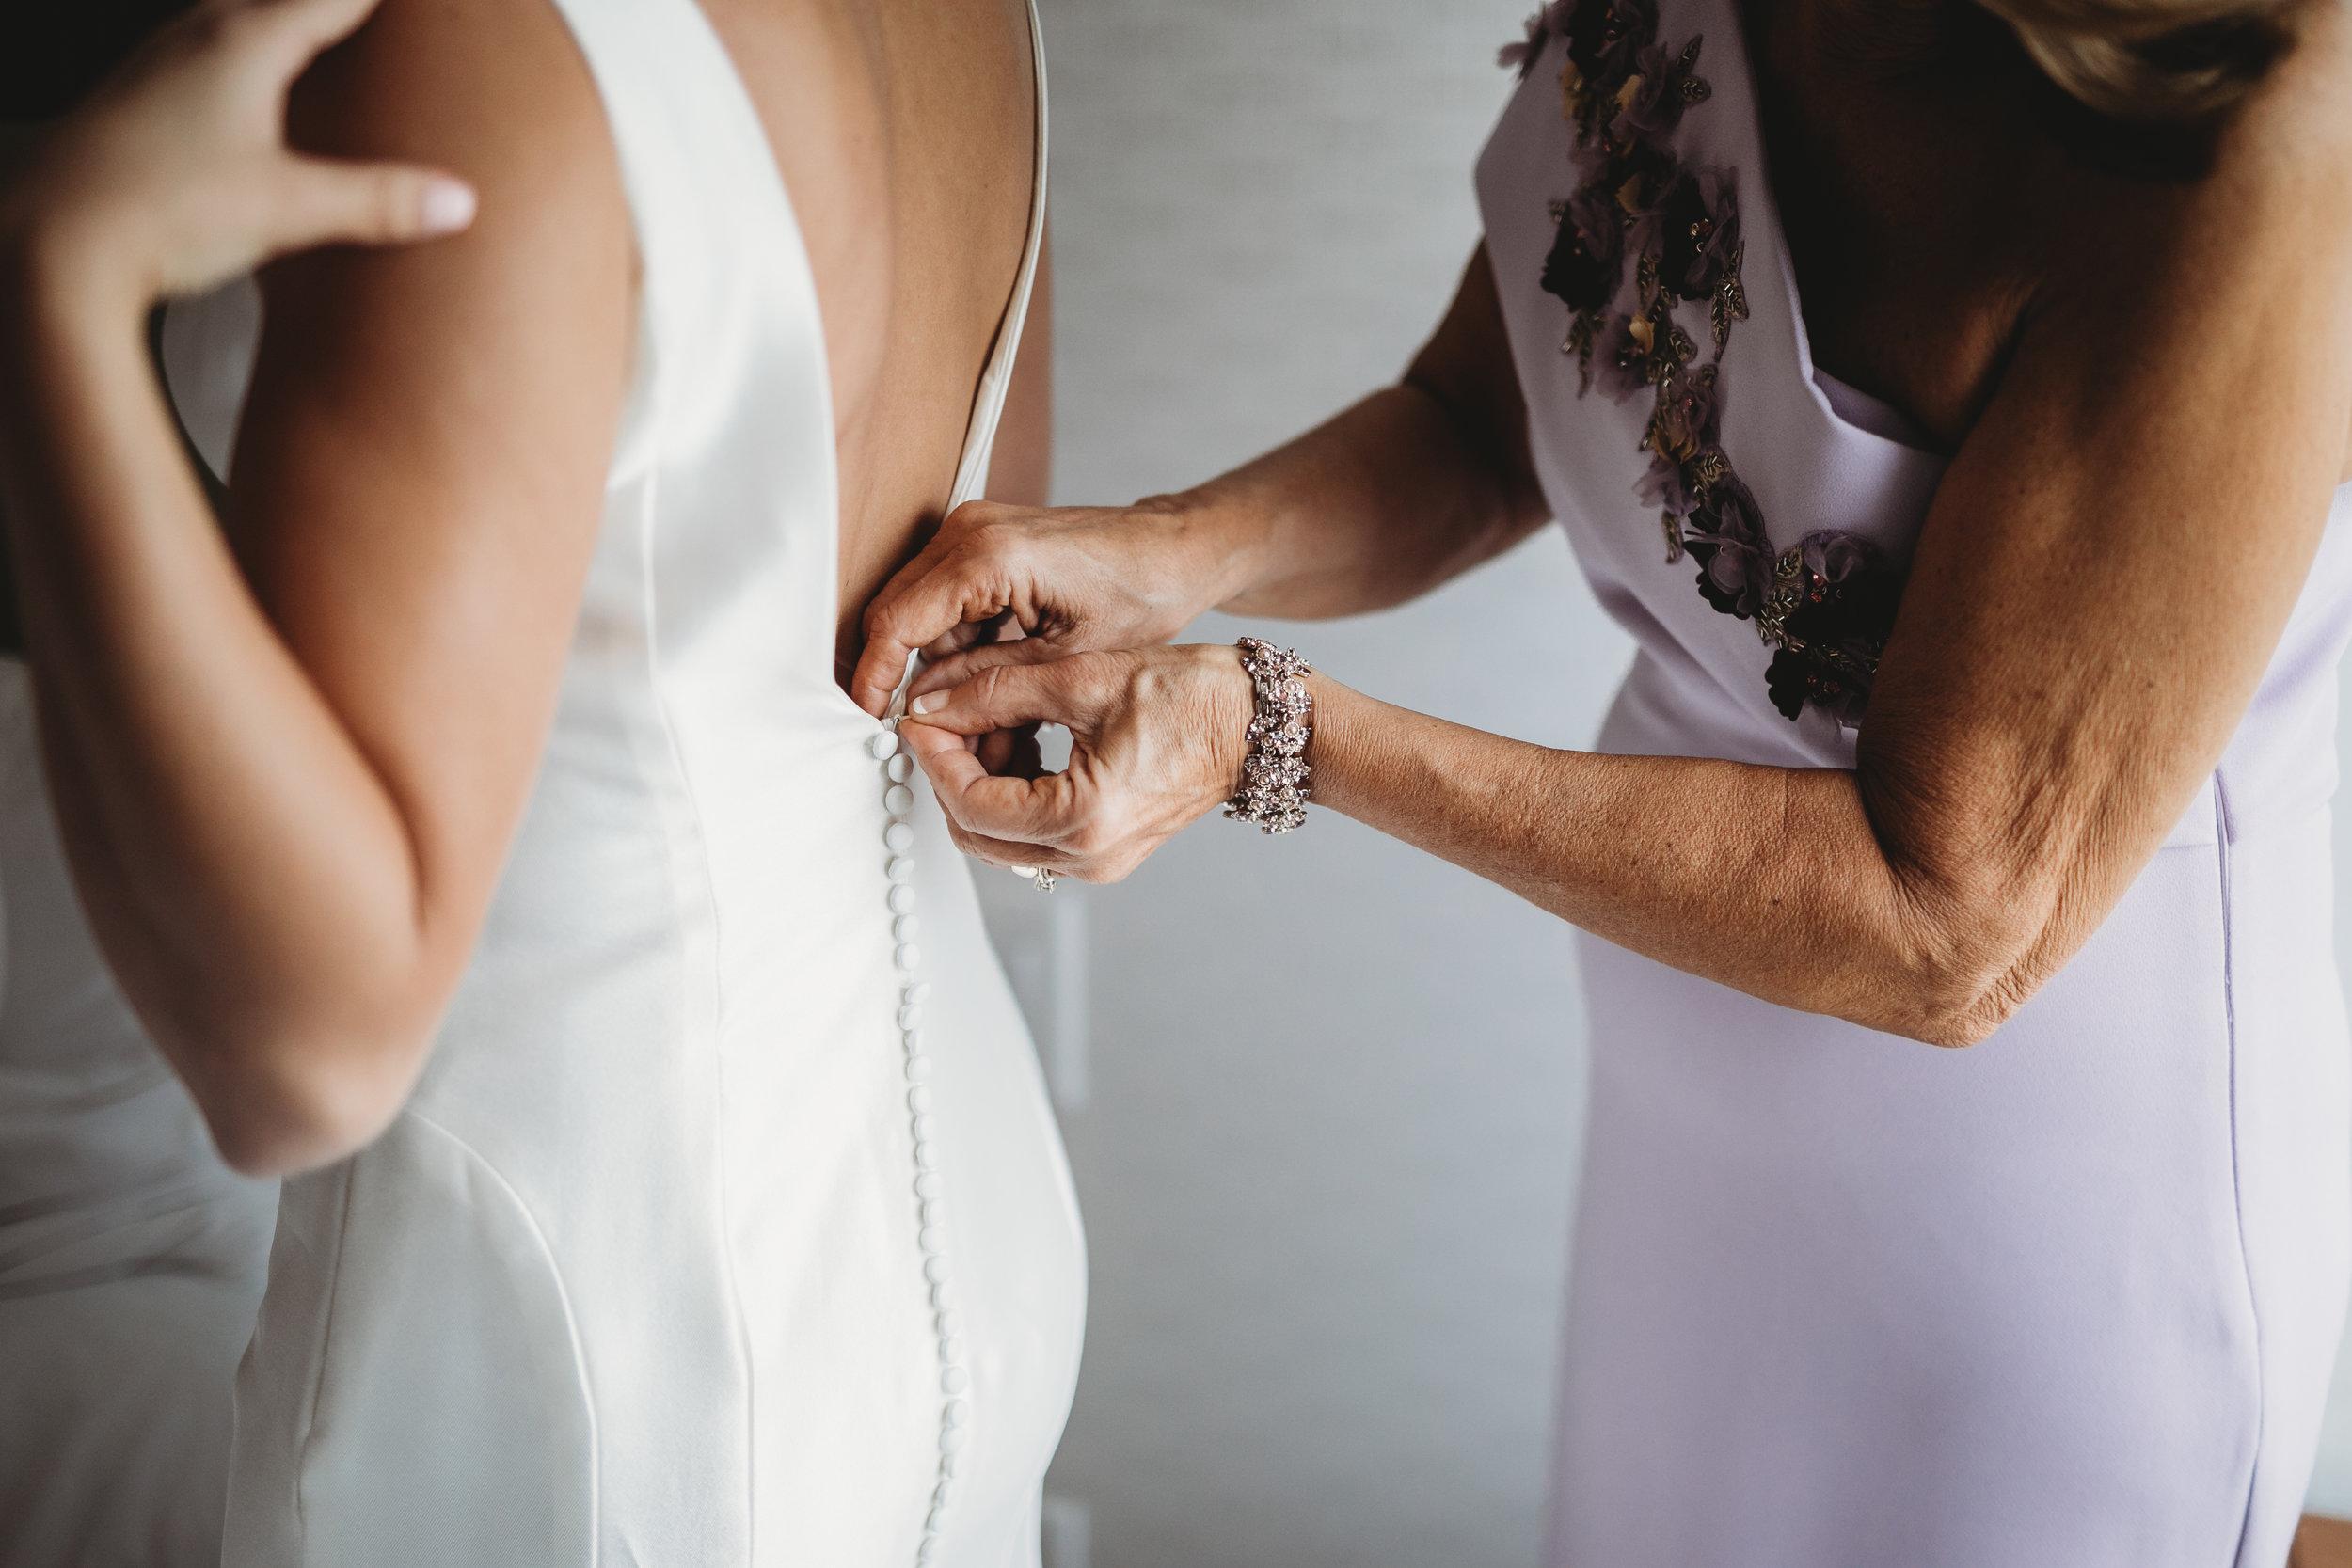 bride-getting-ready-in-hotel-lauren-ashley-studios-zipping-dress.jpg